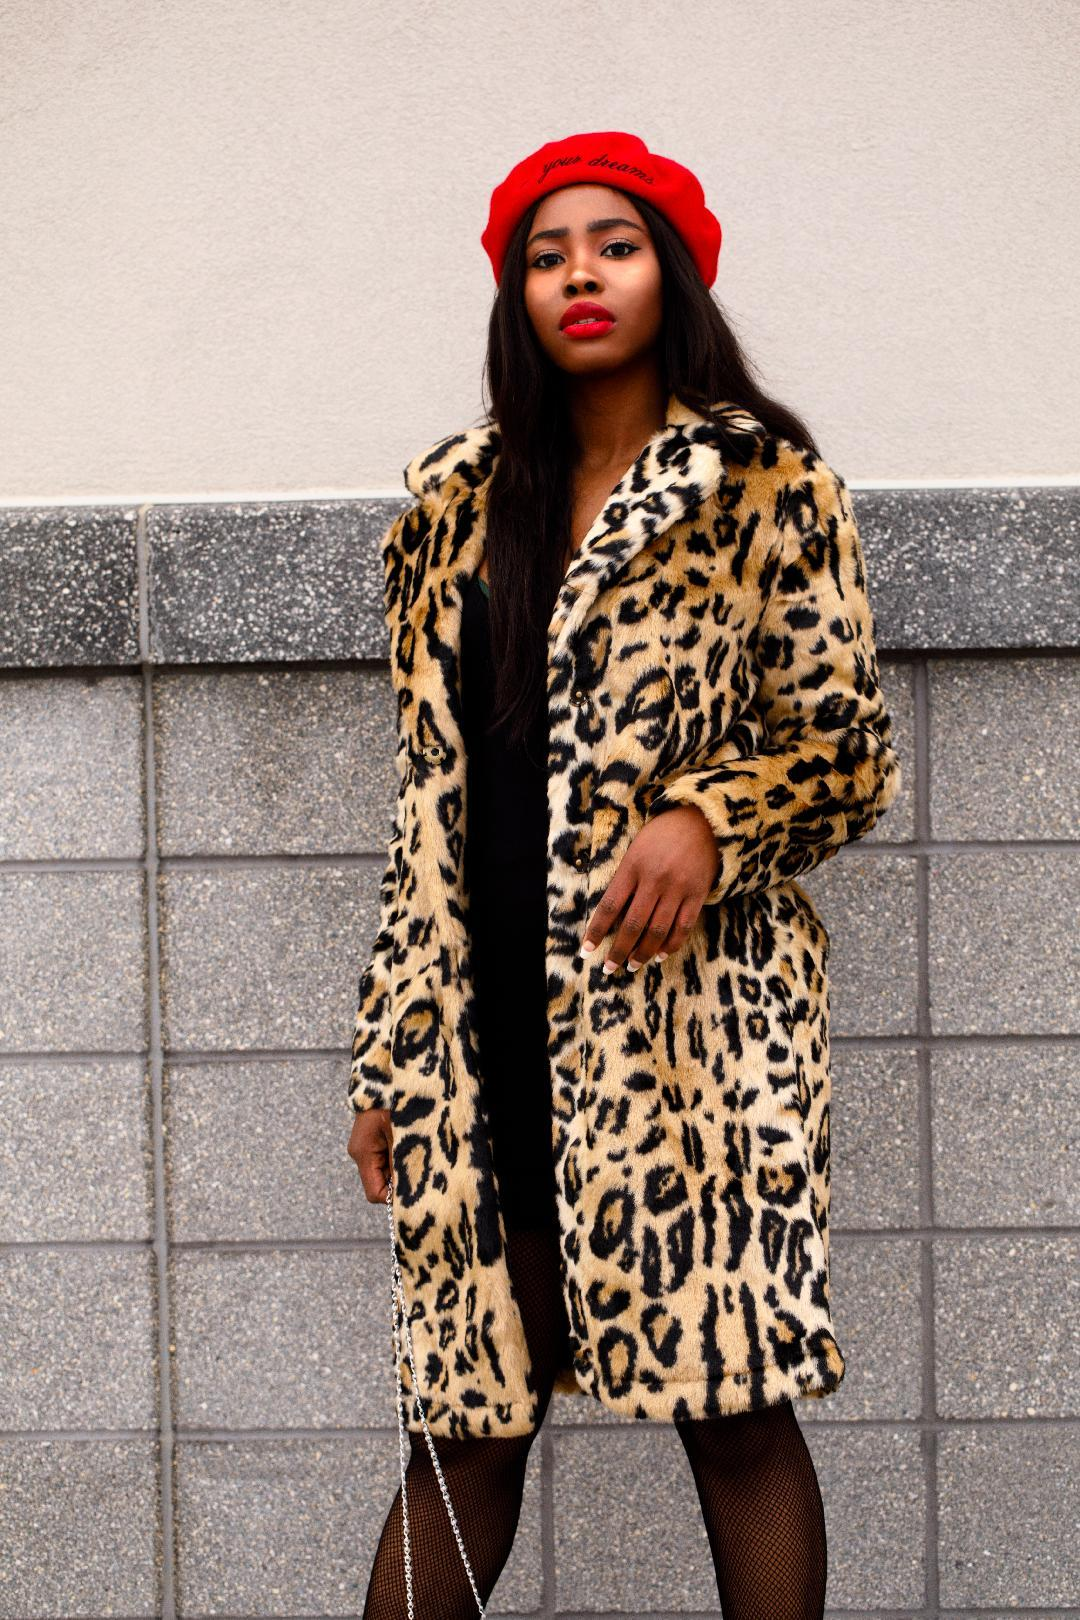 The Cheetah Print Coat